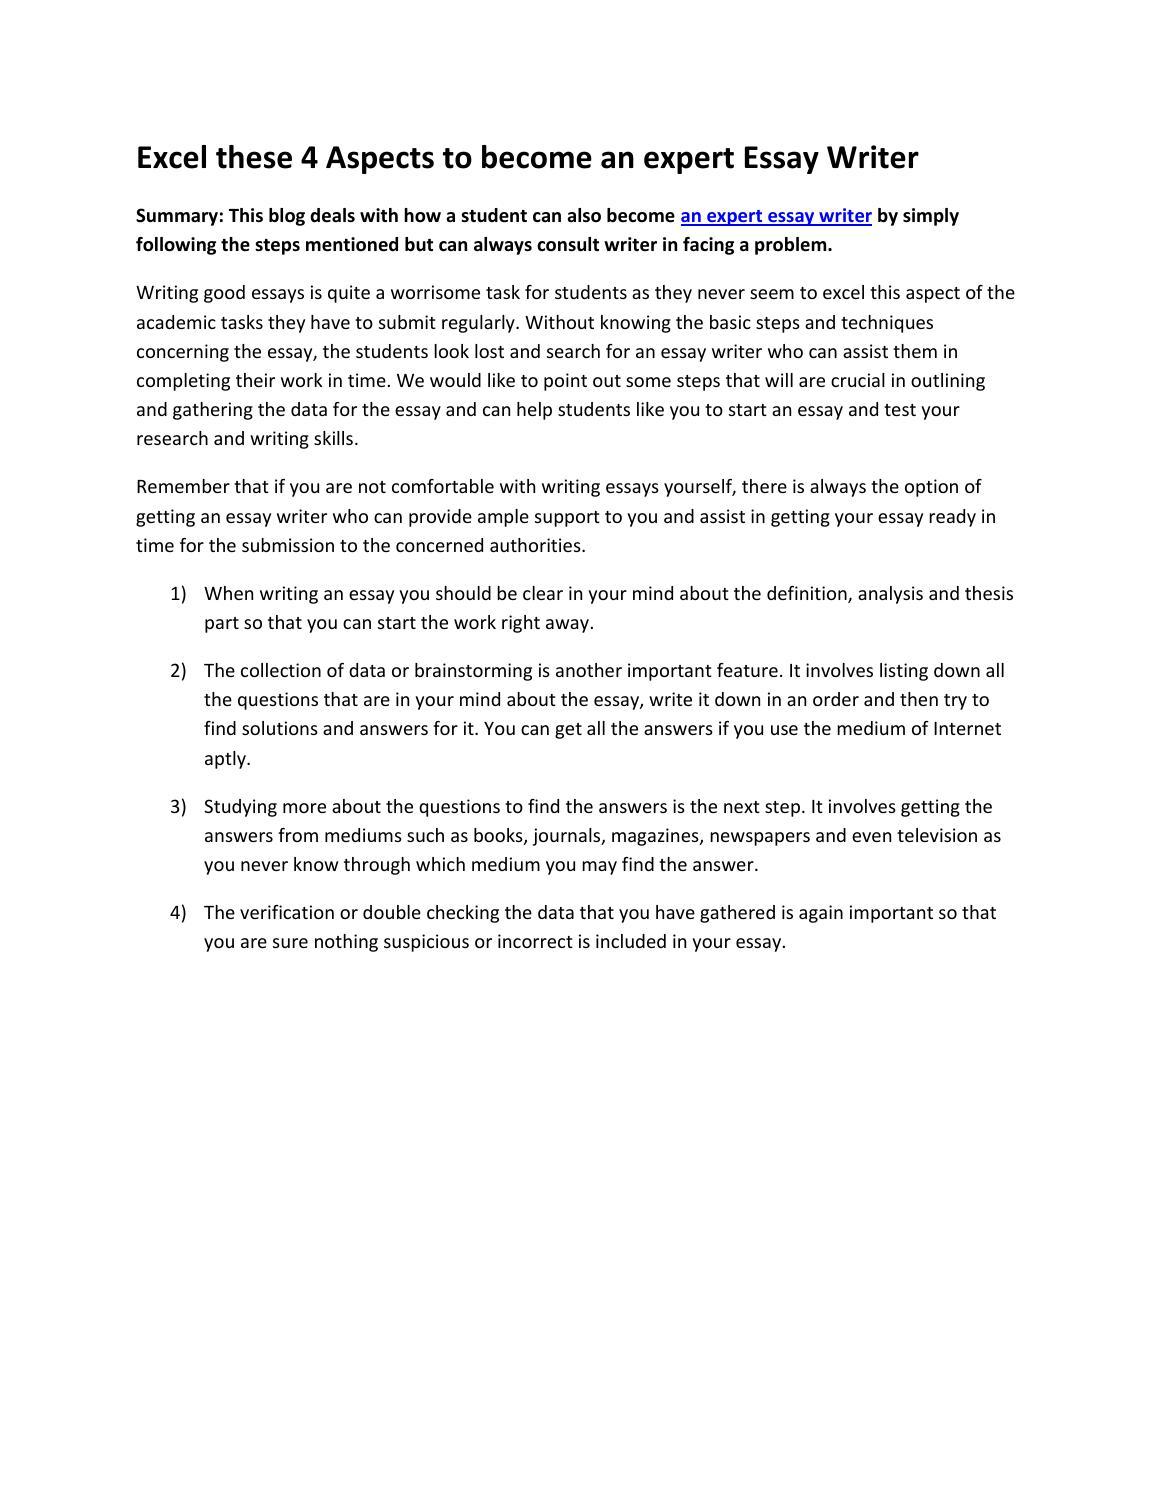 how to excel in studies essay